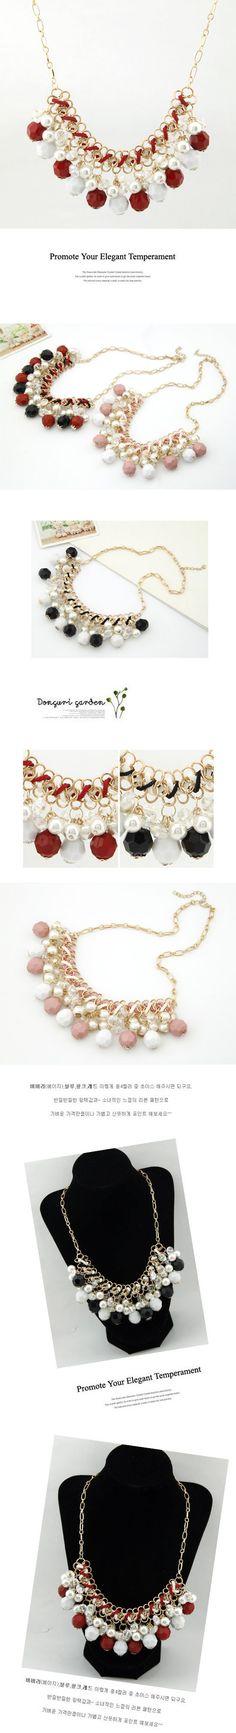 Mechanic Black Imitate Pearl Weave Alloy Korean Necklaces www.asujewelry.com